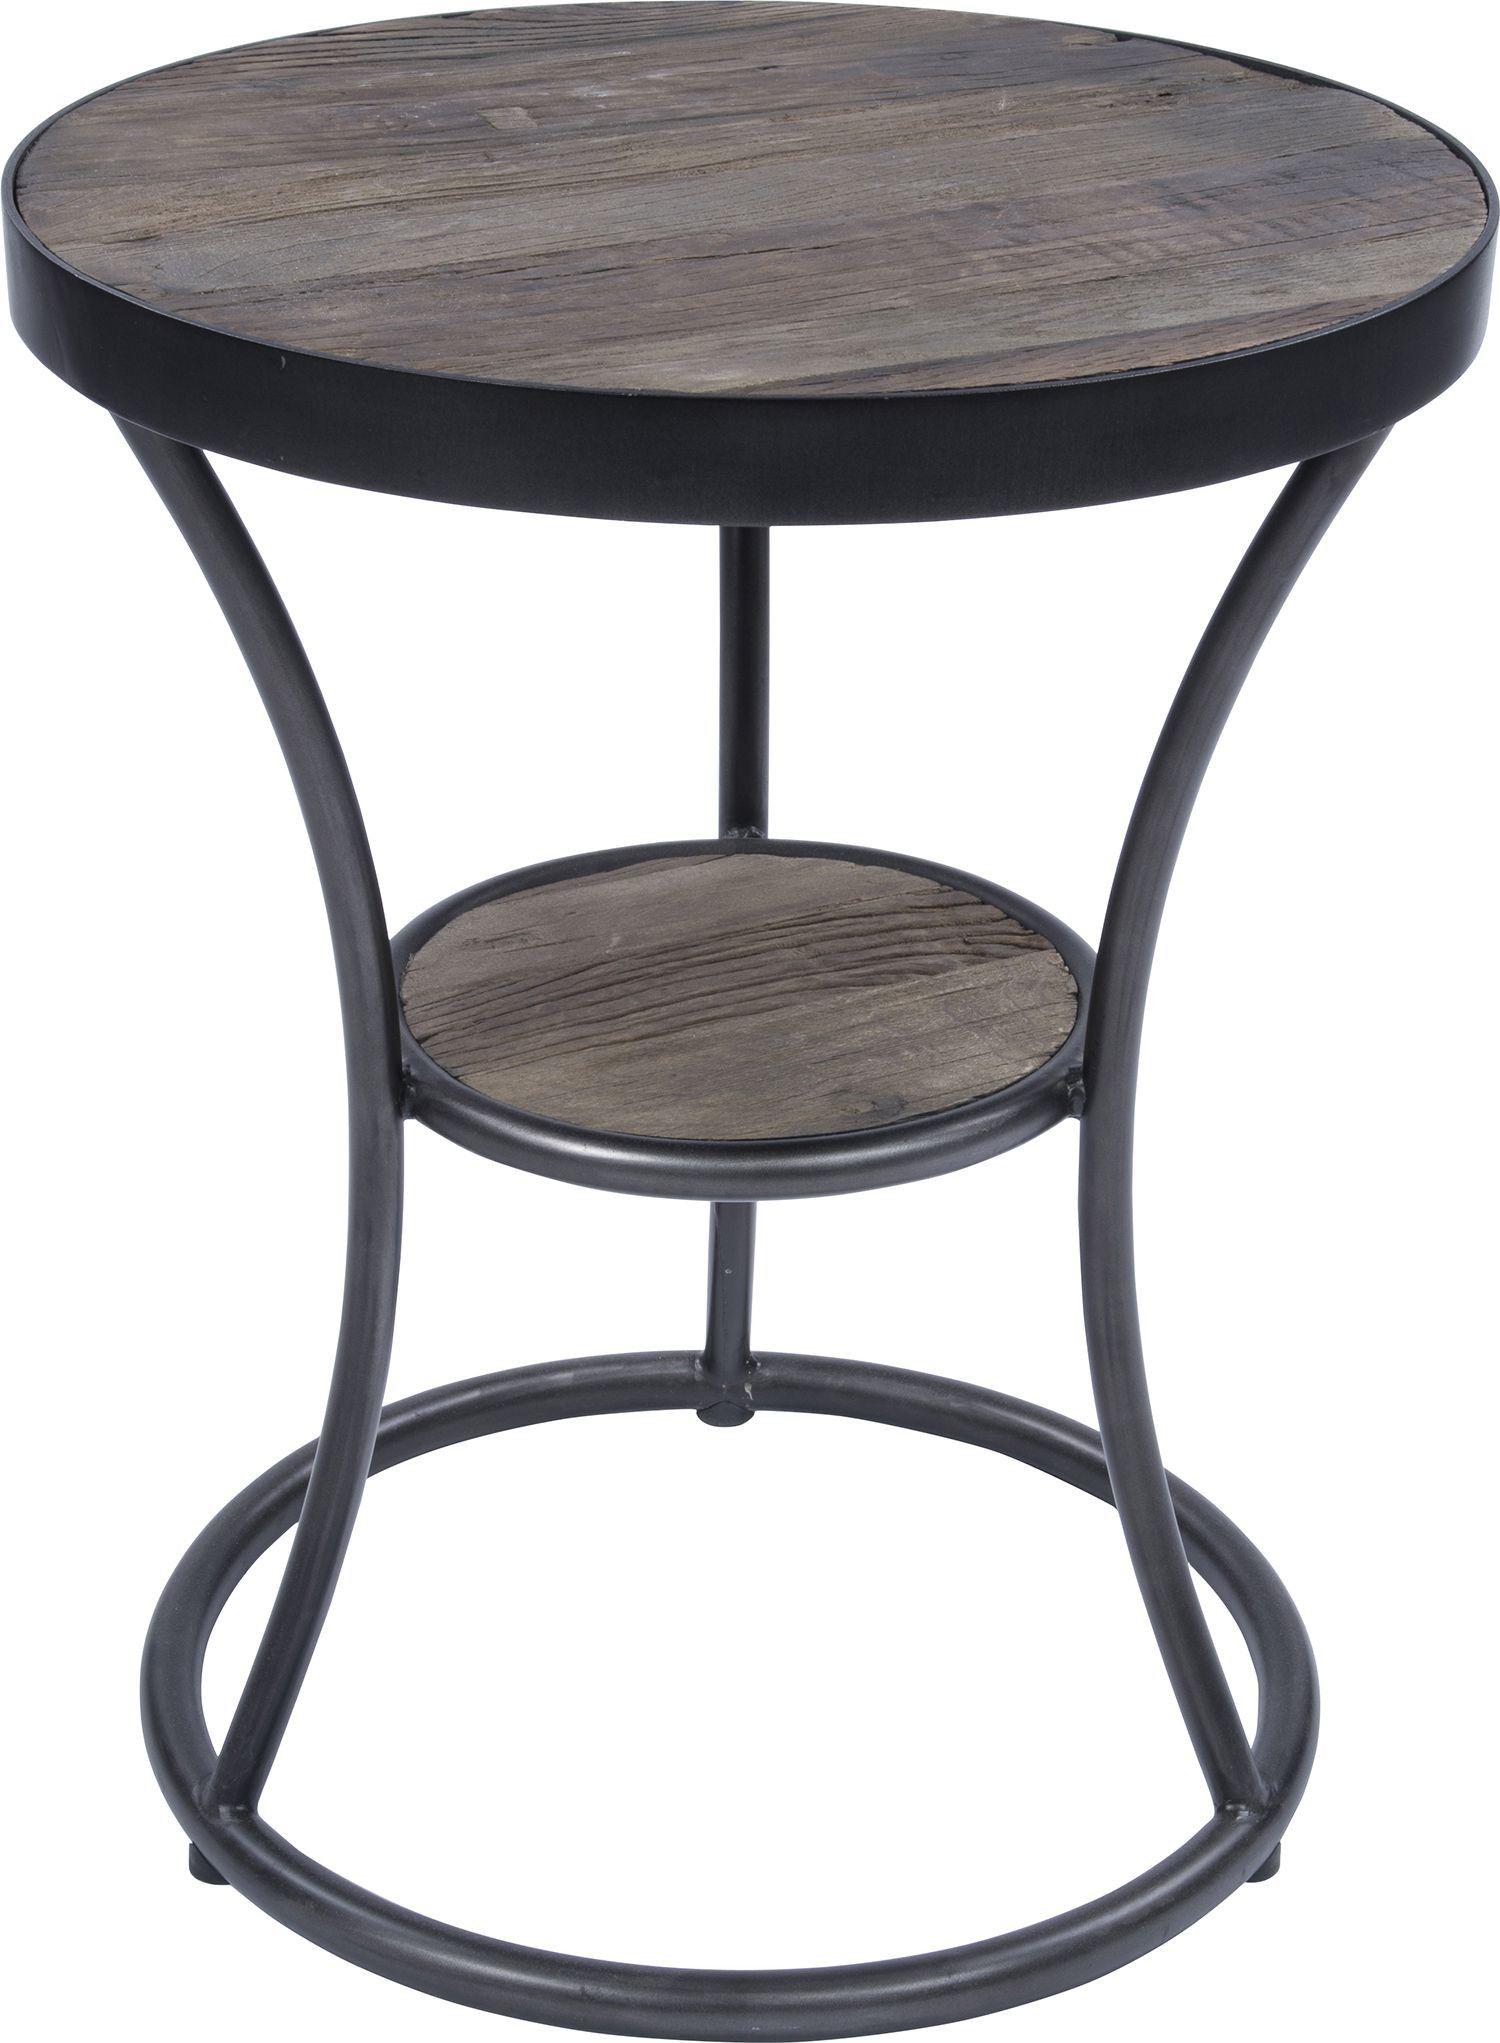 d4c60d4912ab5a0ea7843e83f347f22b Top Result 50 Luxury Black and White Coffee Table Image 2017 Shdy7